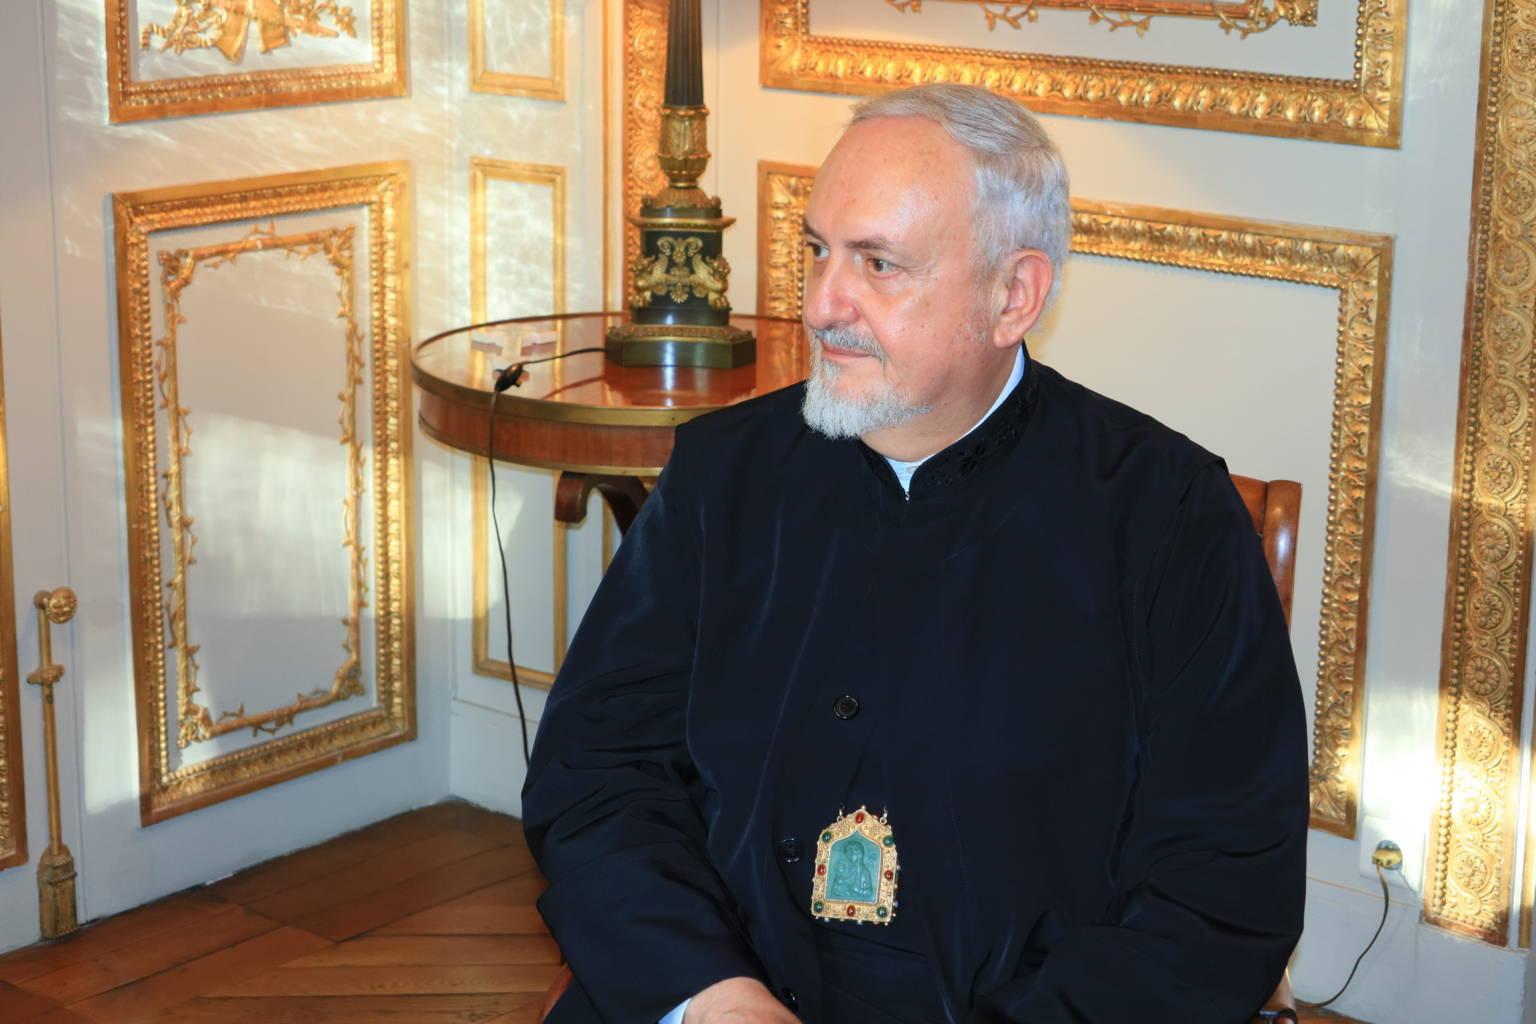 IMG 0311 - Συνάντηση του Μητροπολίτη Γαλλίας με τον ΡωμαιοκαθολικόΑρχιεπίσκοπο Παρισίων